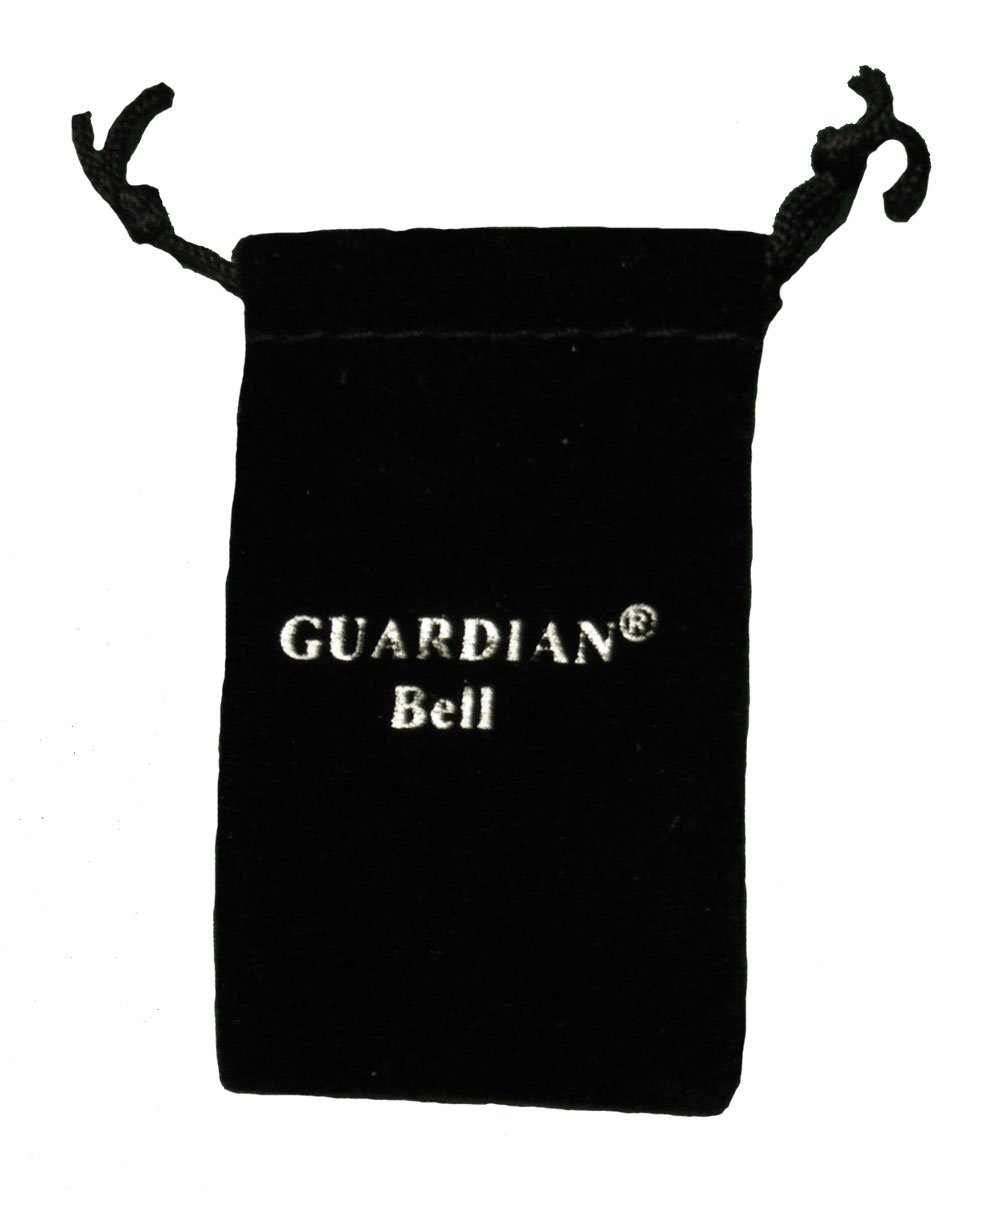 Guardian® Mustang Horse Motorcycle Biker Luck Gremlin Riding Bell or Key Ring